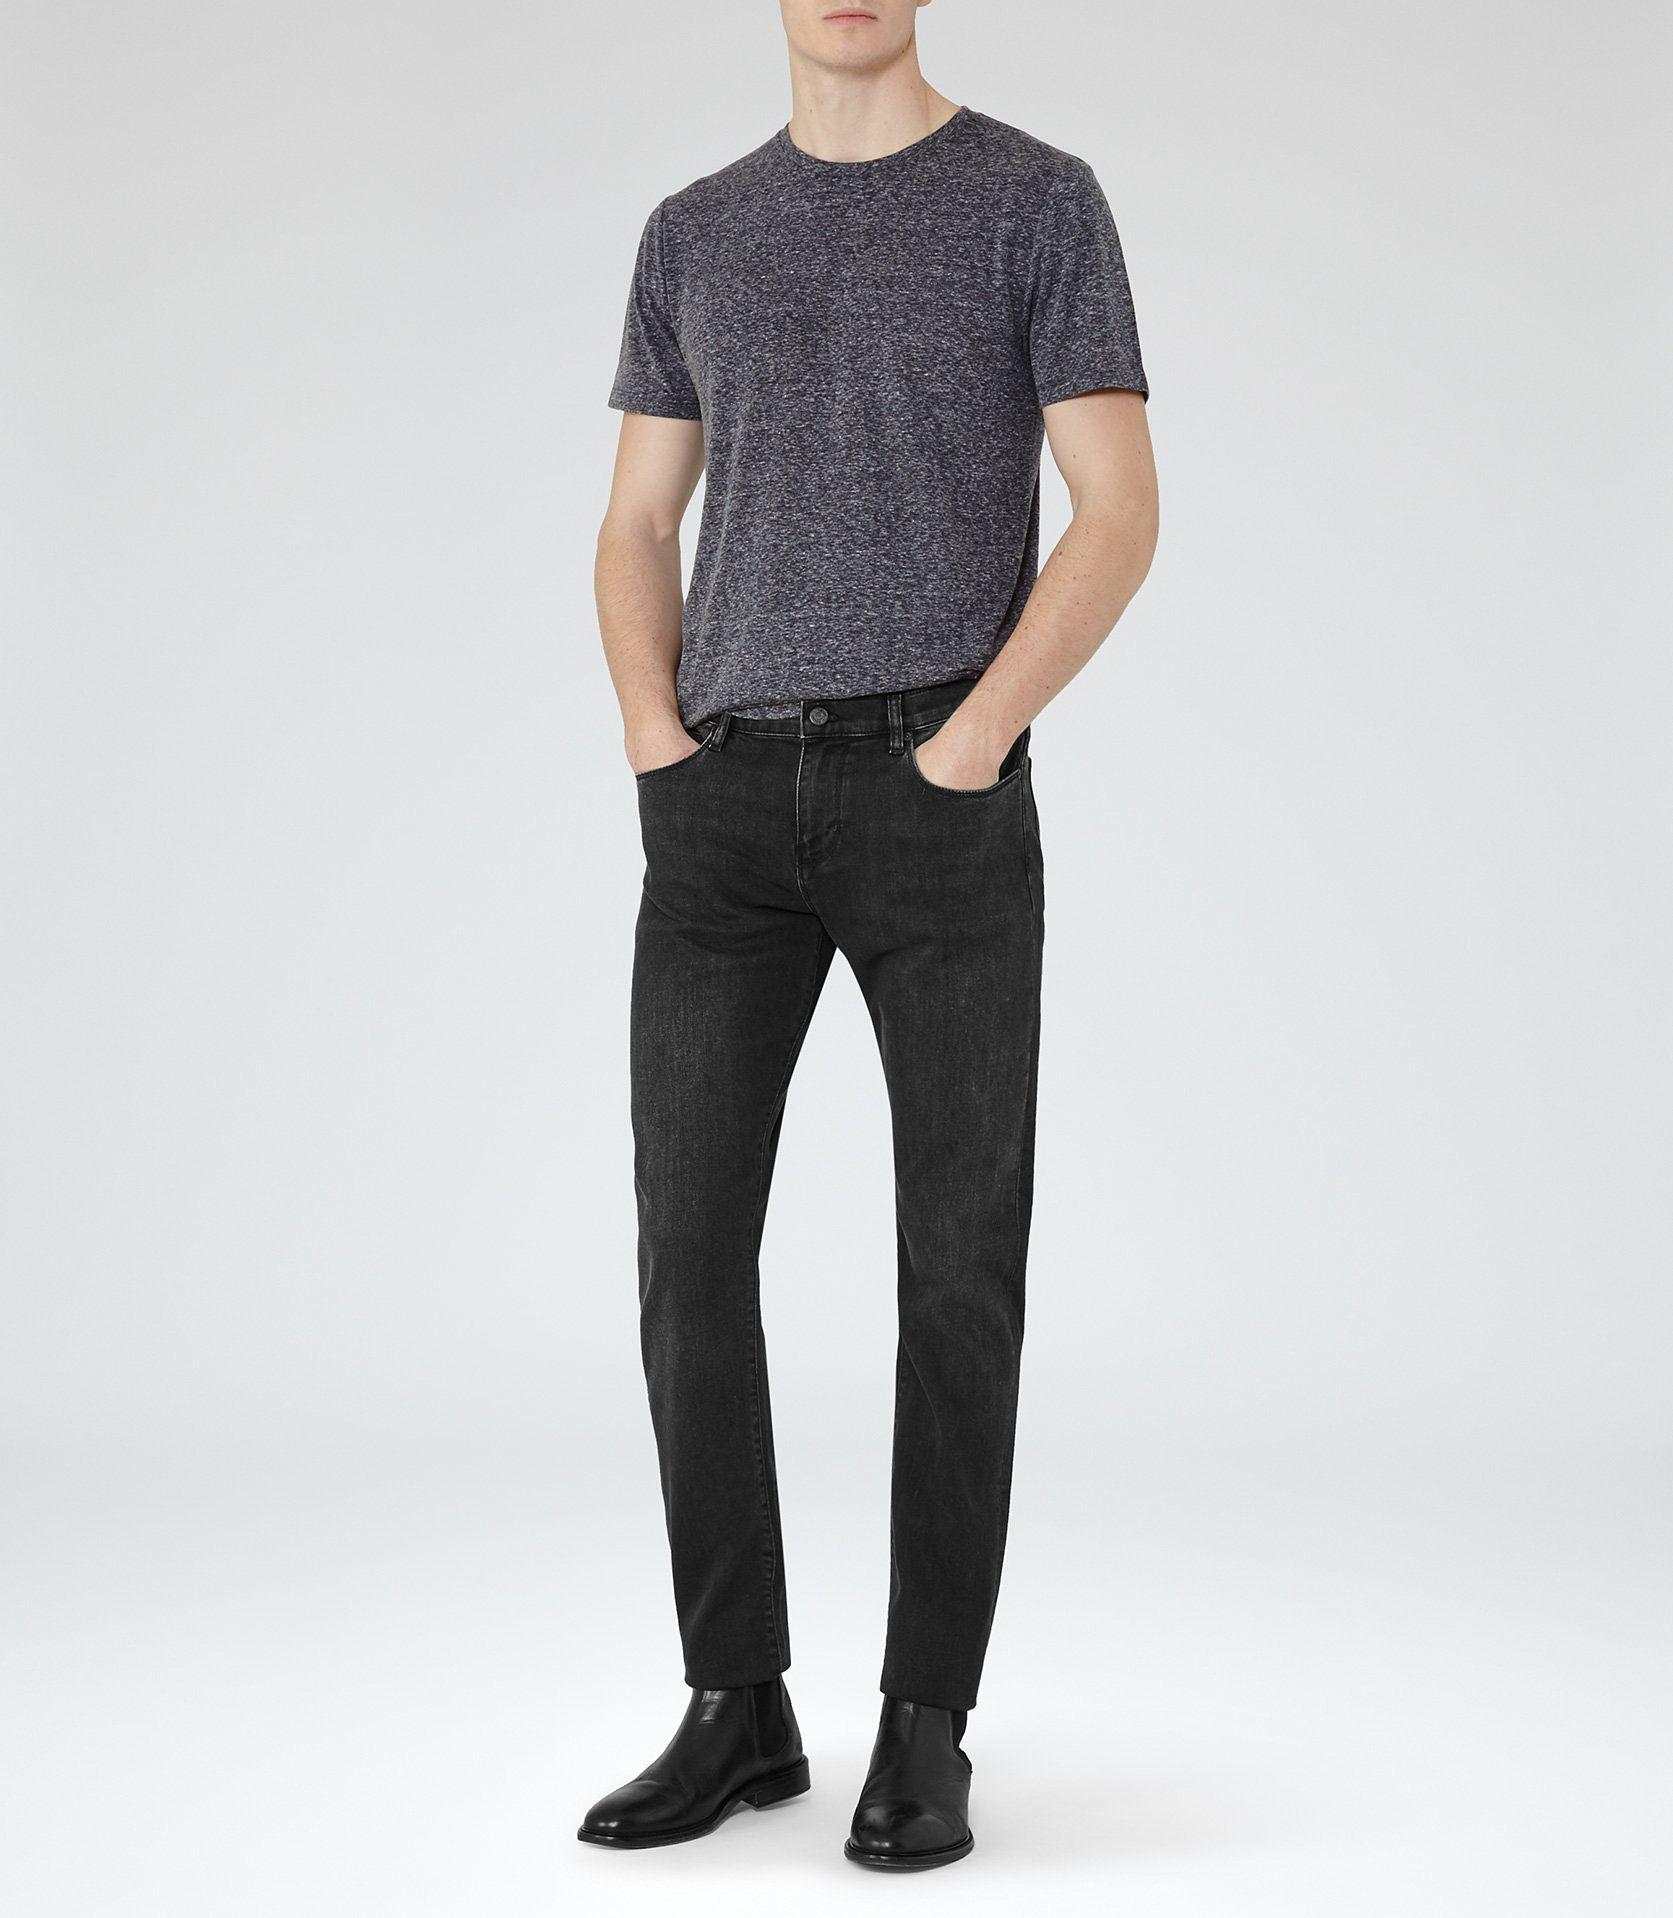 Dark grey t-shirt + Black Grey jeans + chelsea boots